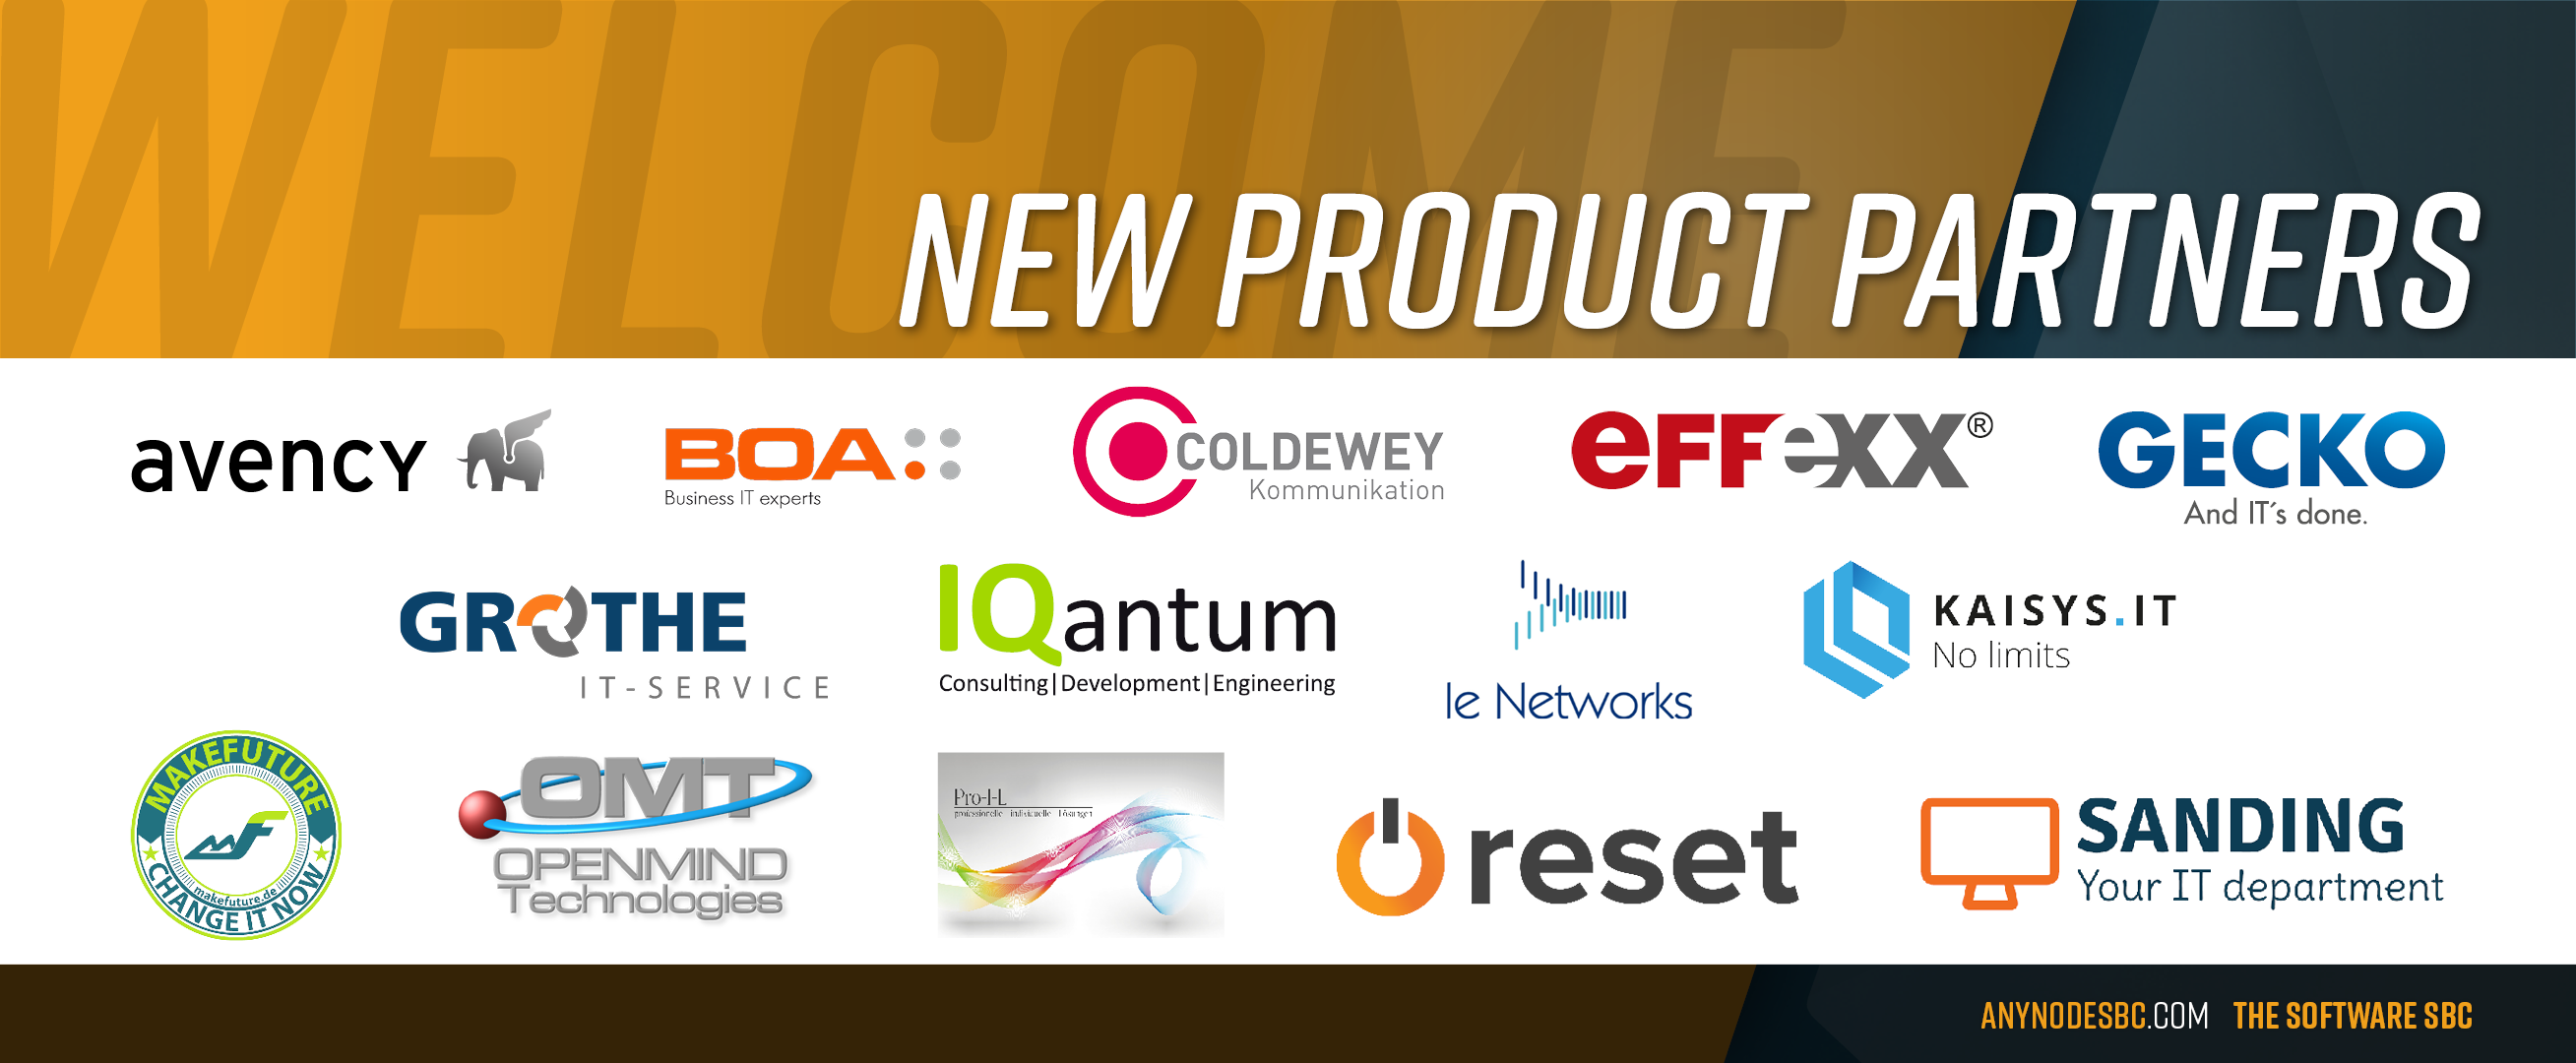 Neue anynode Produktpartner im August 2020!